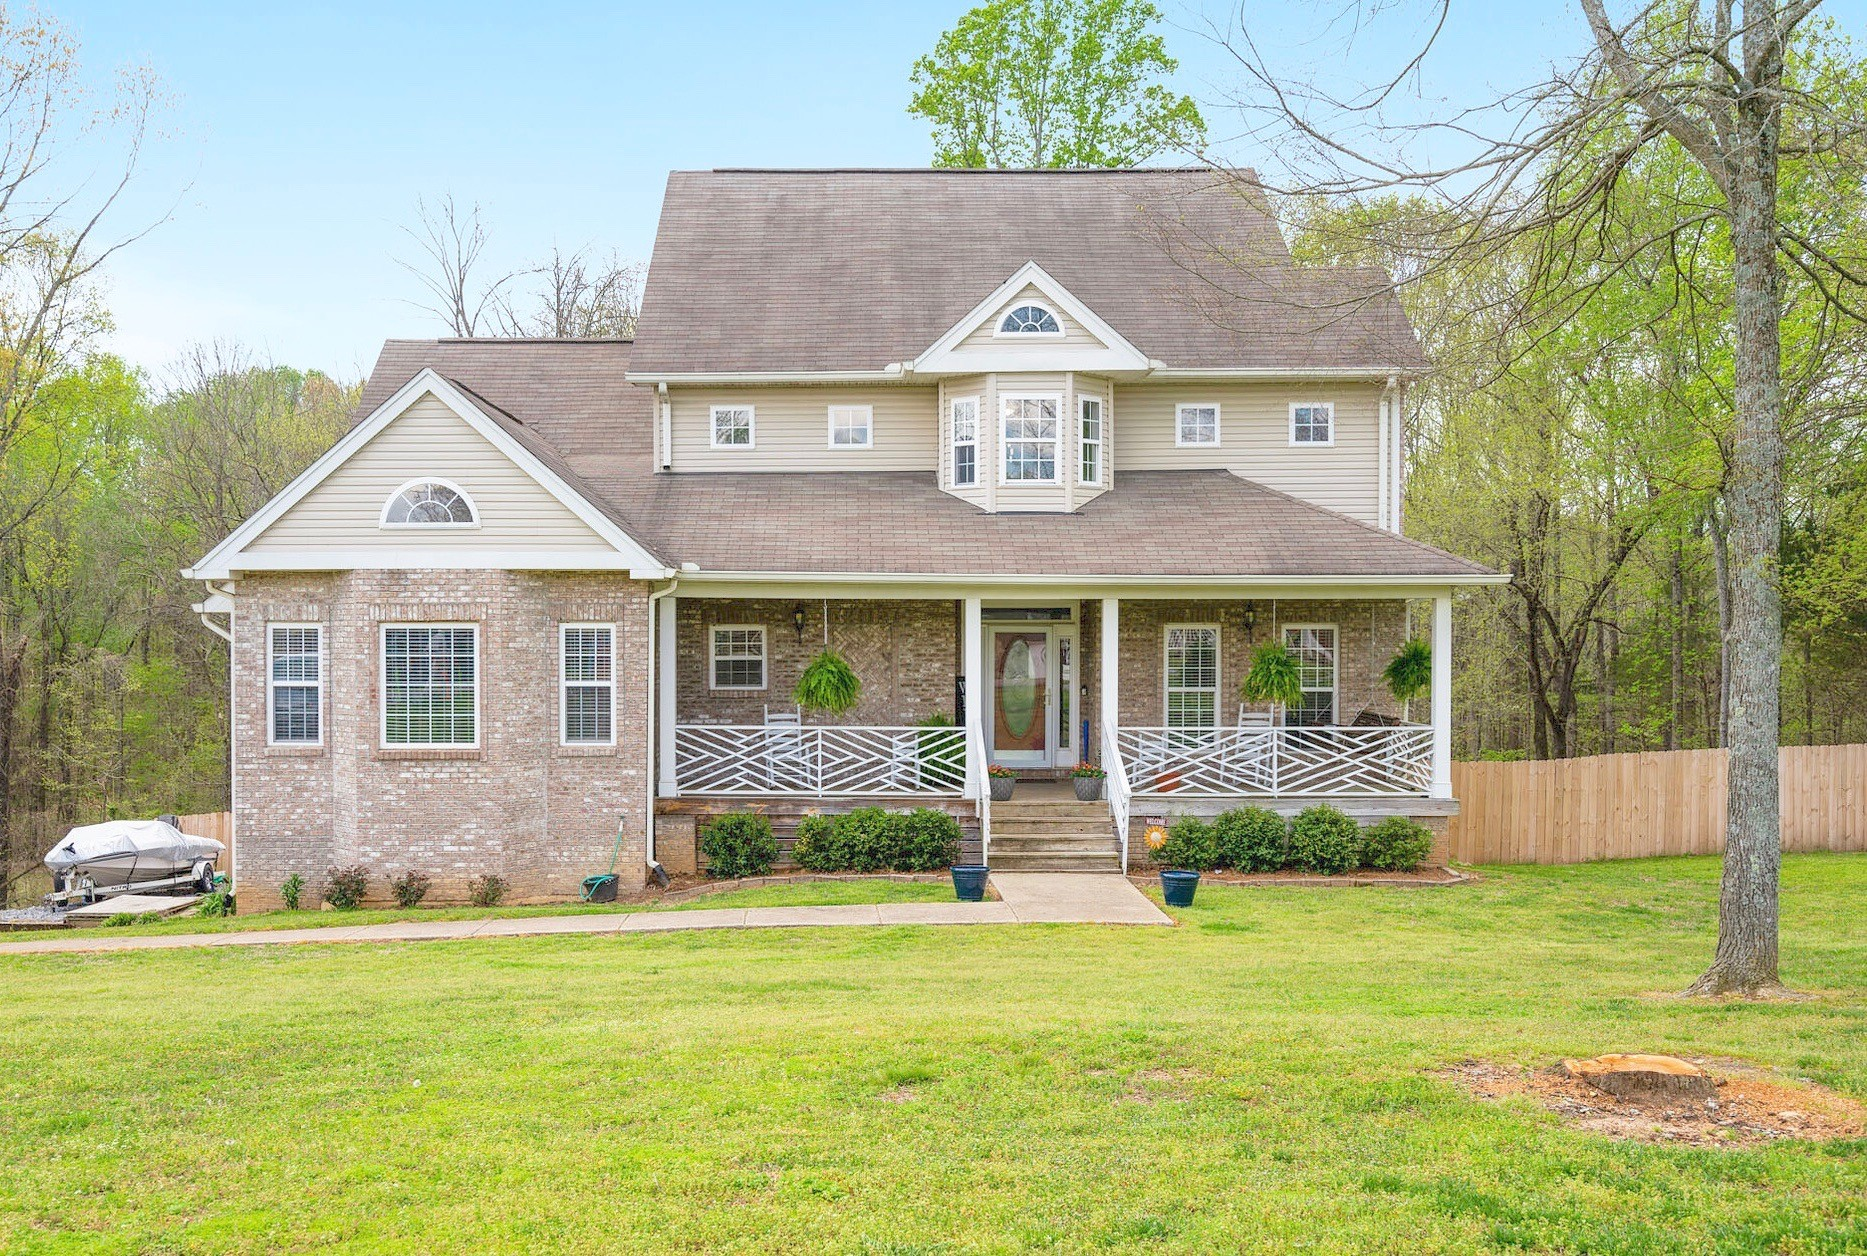 2754 Gideon Rd, Greenbrier, TN 37073 - Greenbrier, TN real estate listing